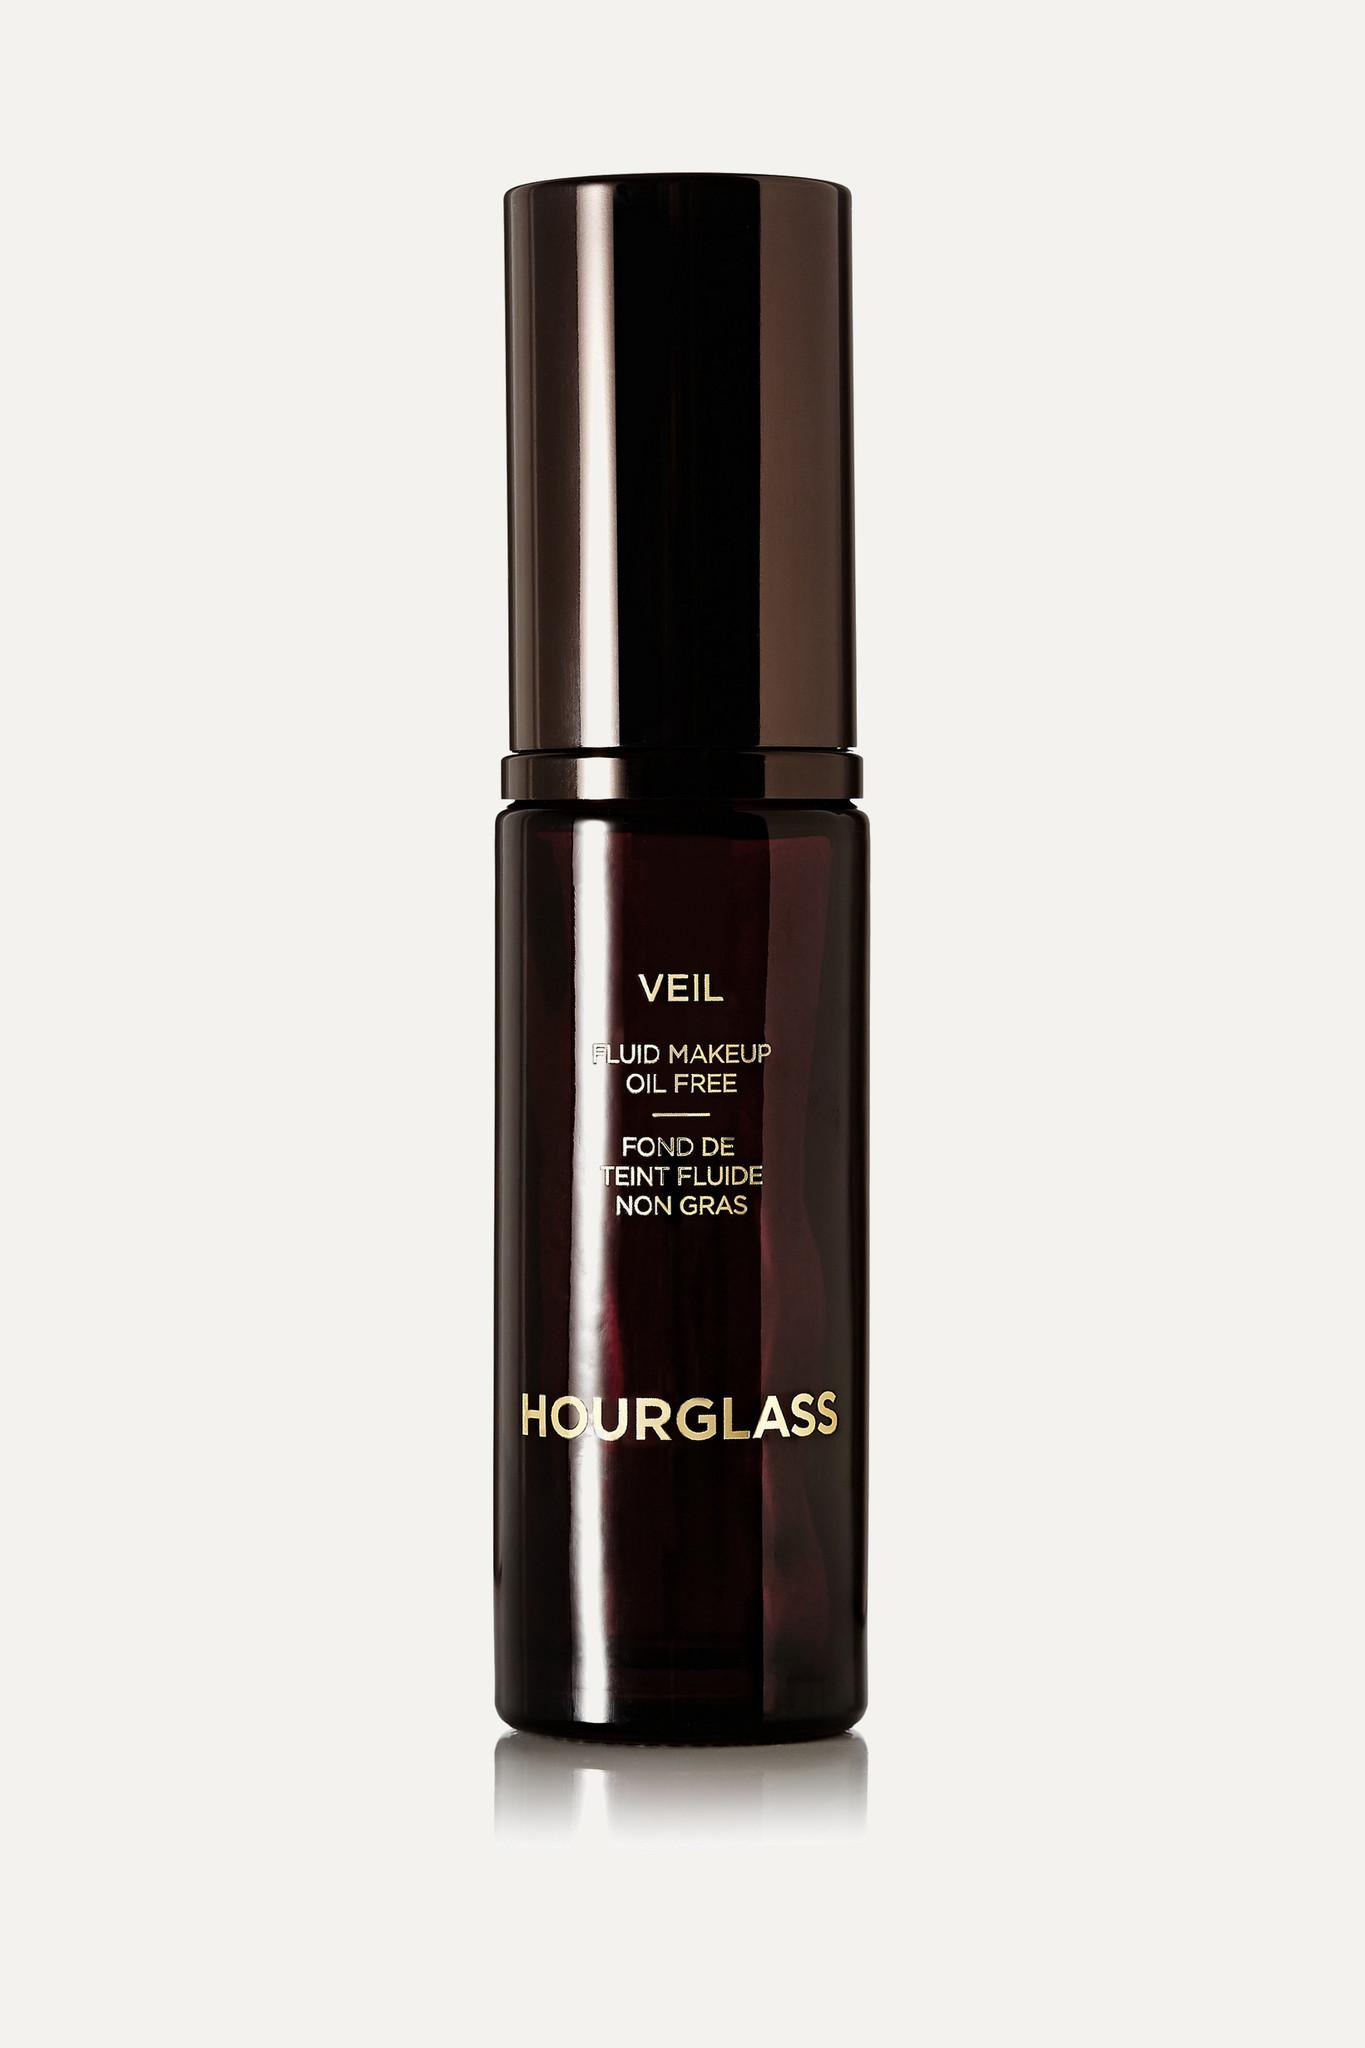 HOURGLASS - Veil Fluid Makeup No 6 - Sable, 30ml - Neutrals - one size